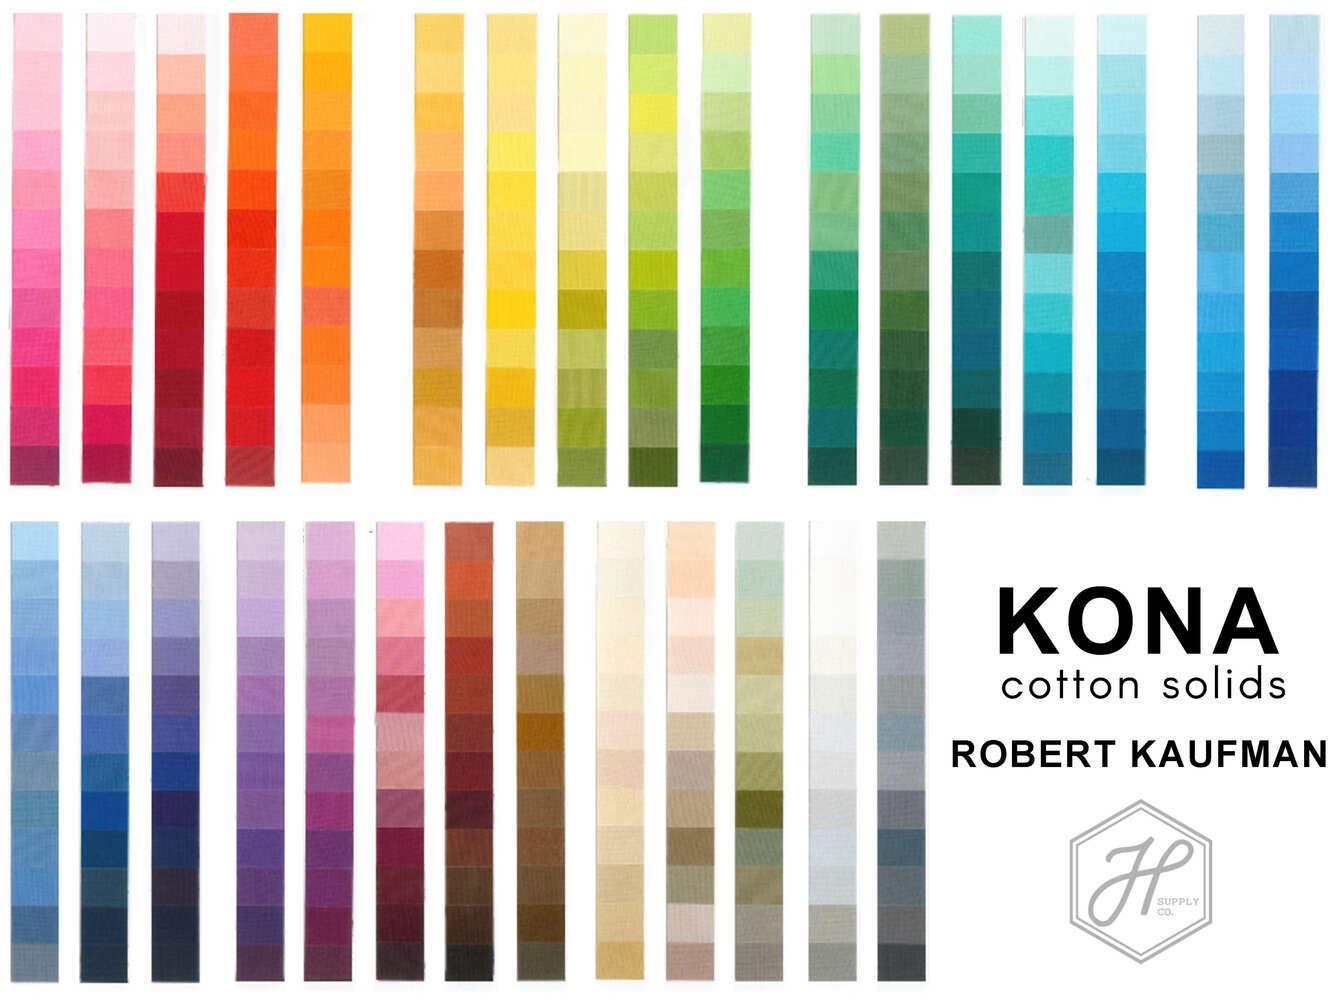 Kona Cotton Solids Poster Image